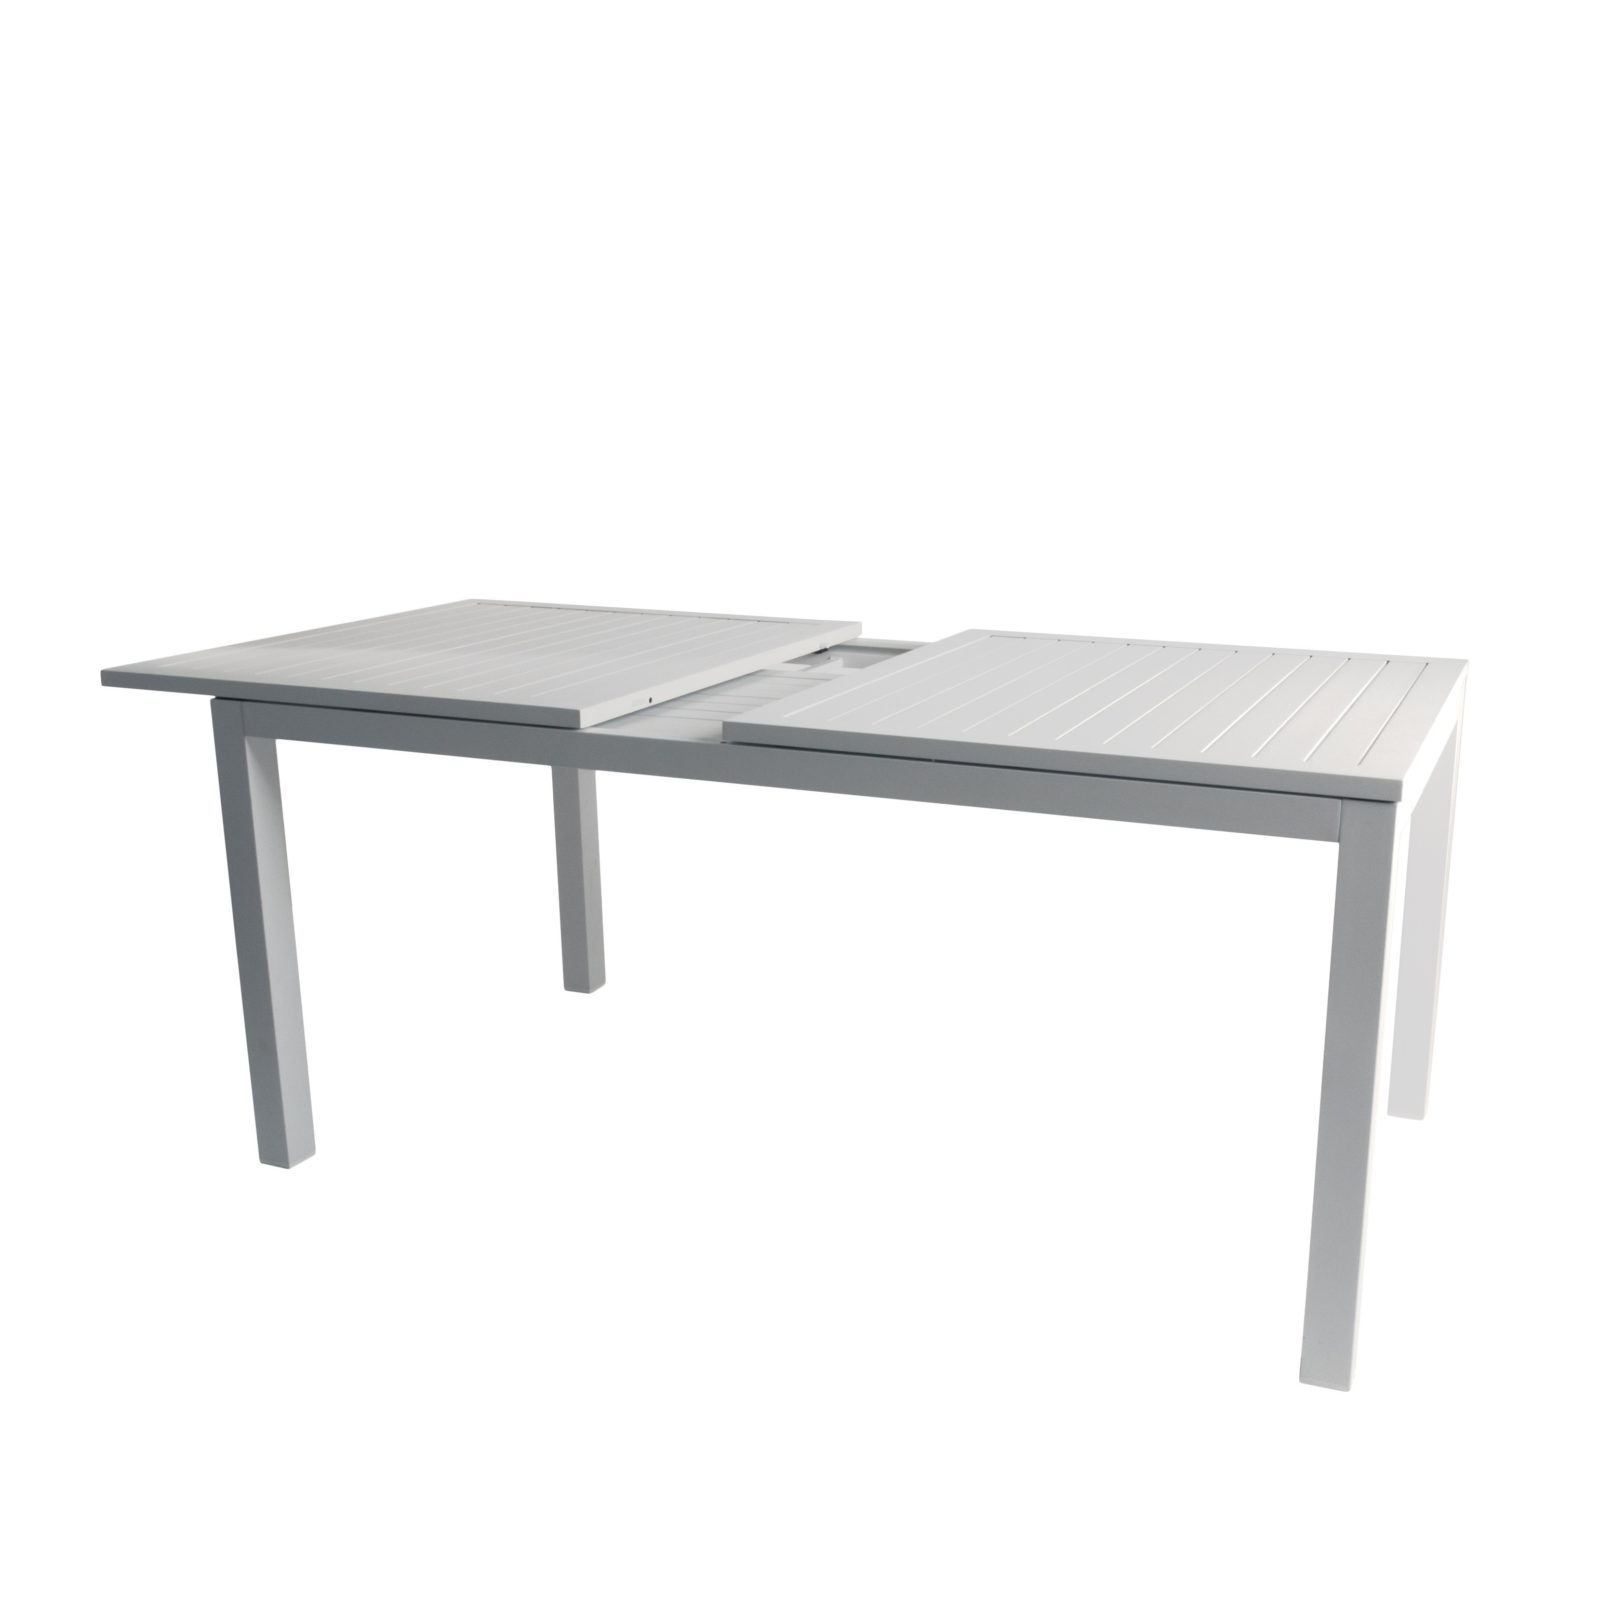 Lafayette udtræksbord aluminium 283x100 cm 65882003